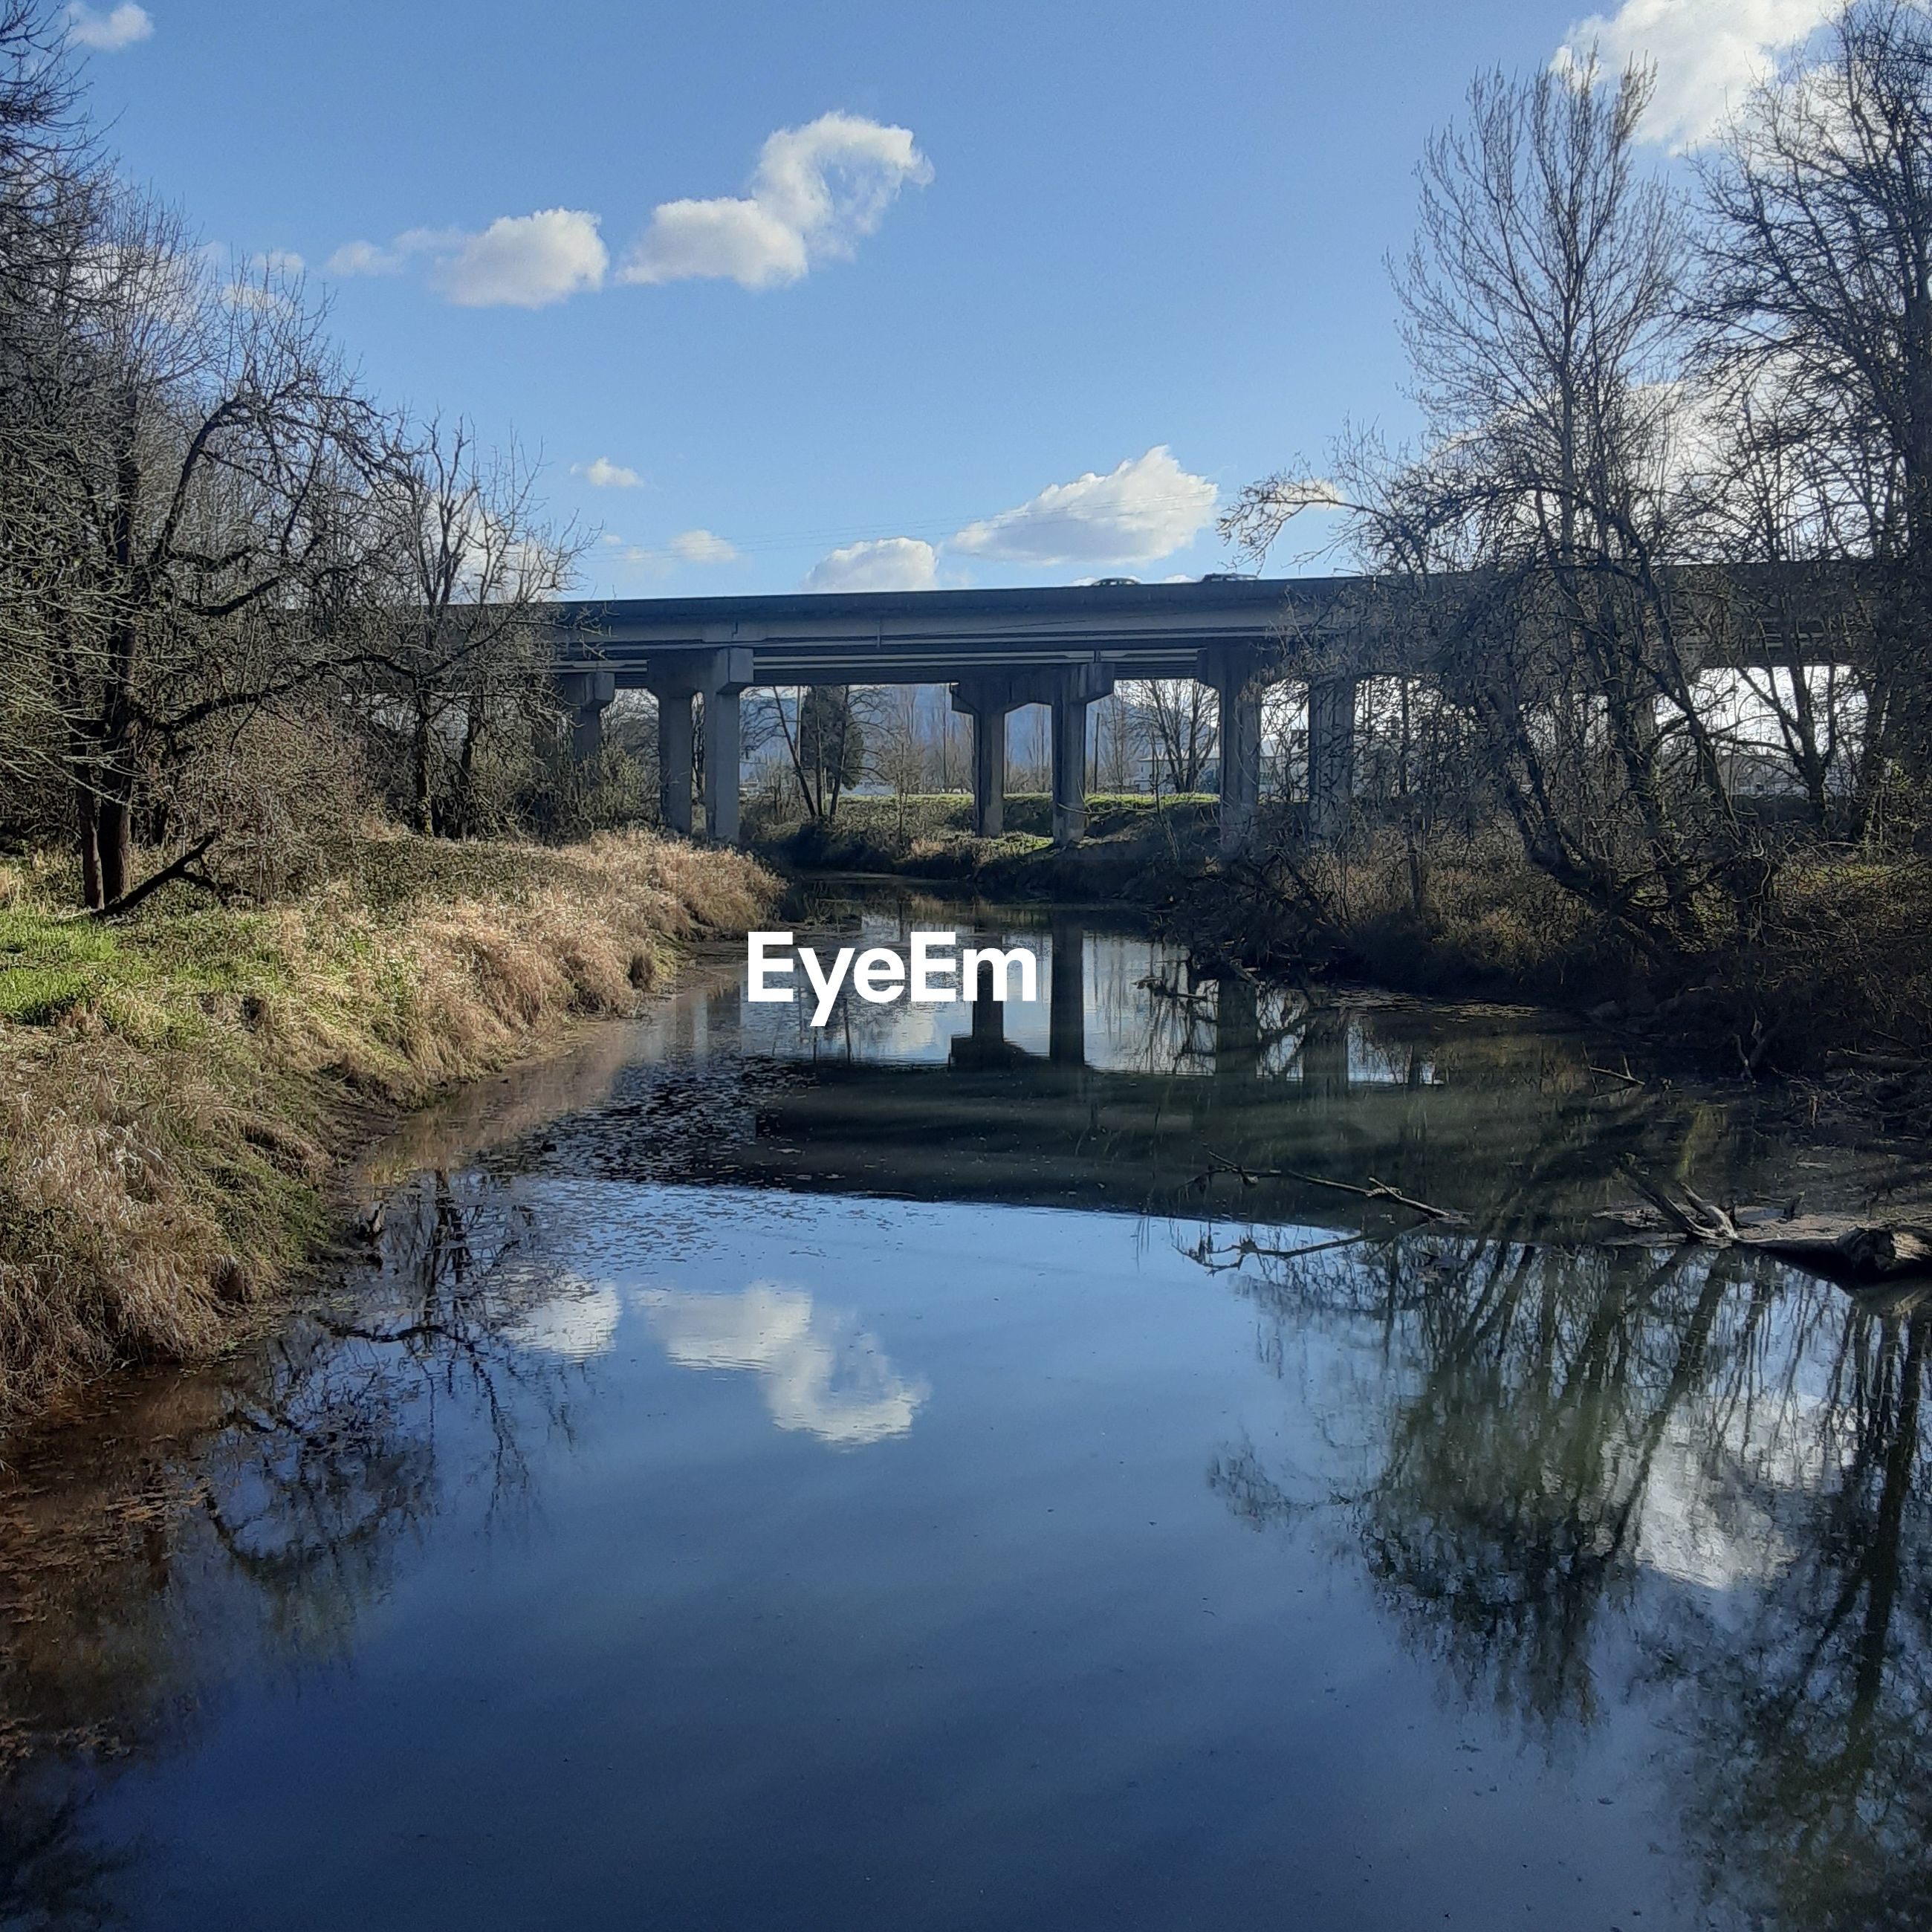 BRIDGE OVER RIVER AMIDST TREES AGAINST SKY